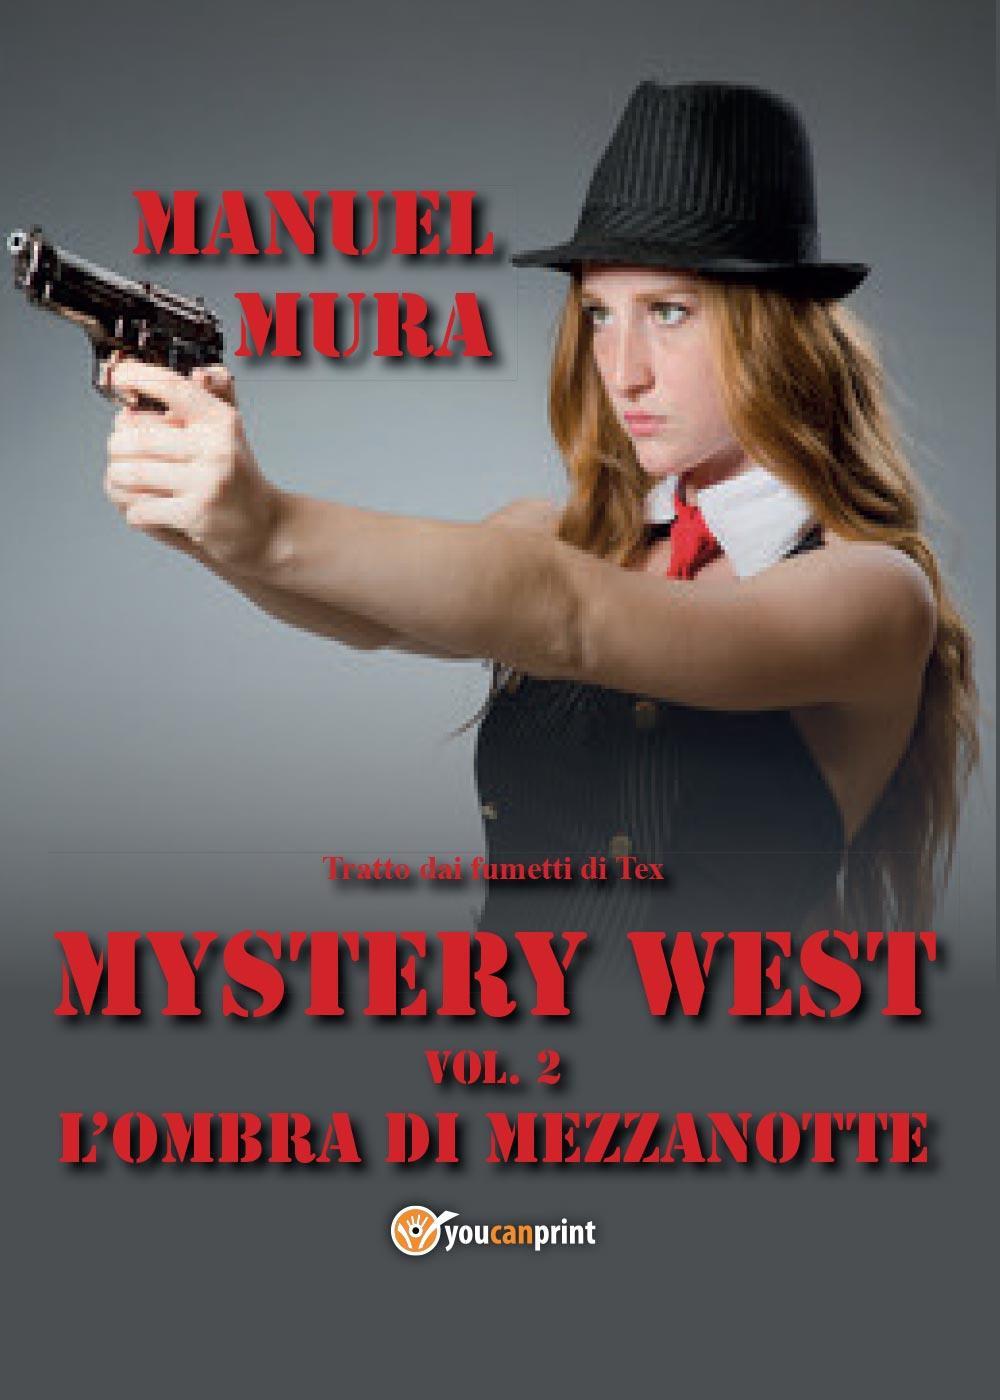 Mystery West vol.2 - L'ombra di mezzanotte